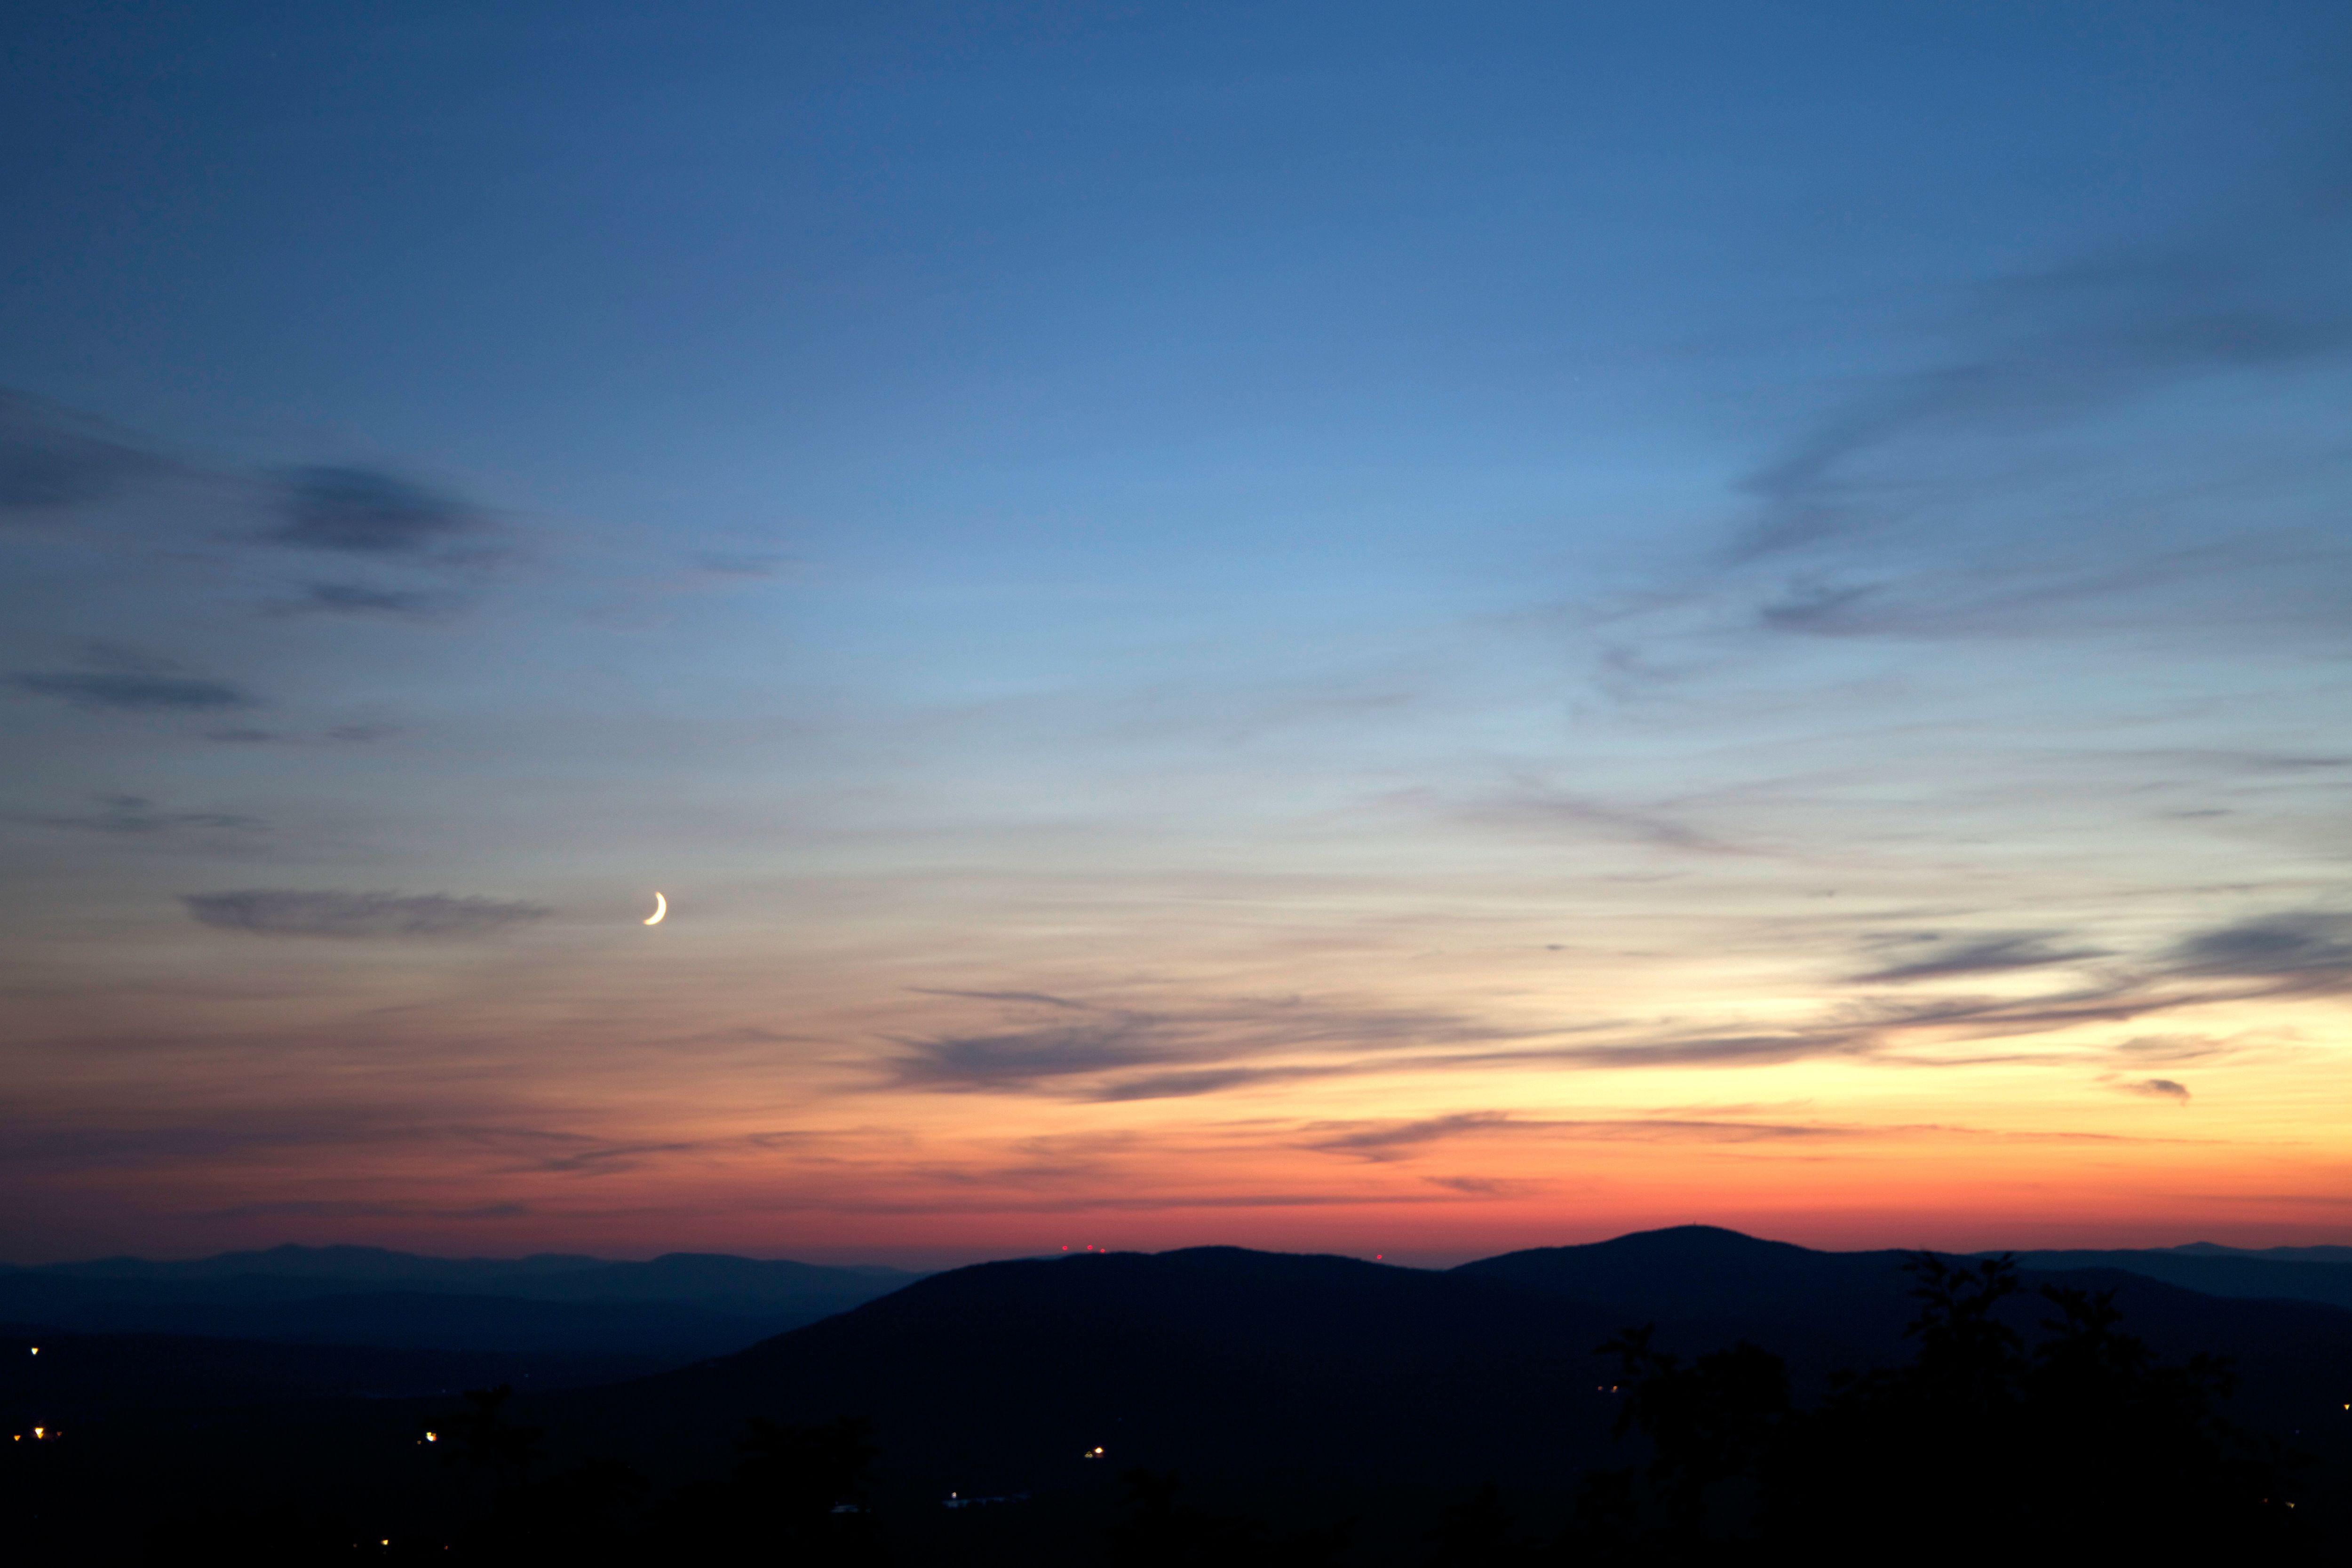 Sunset Sky Google Search